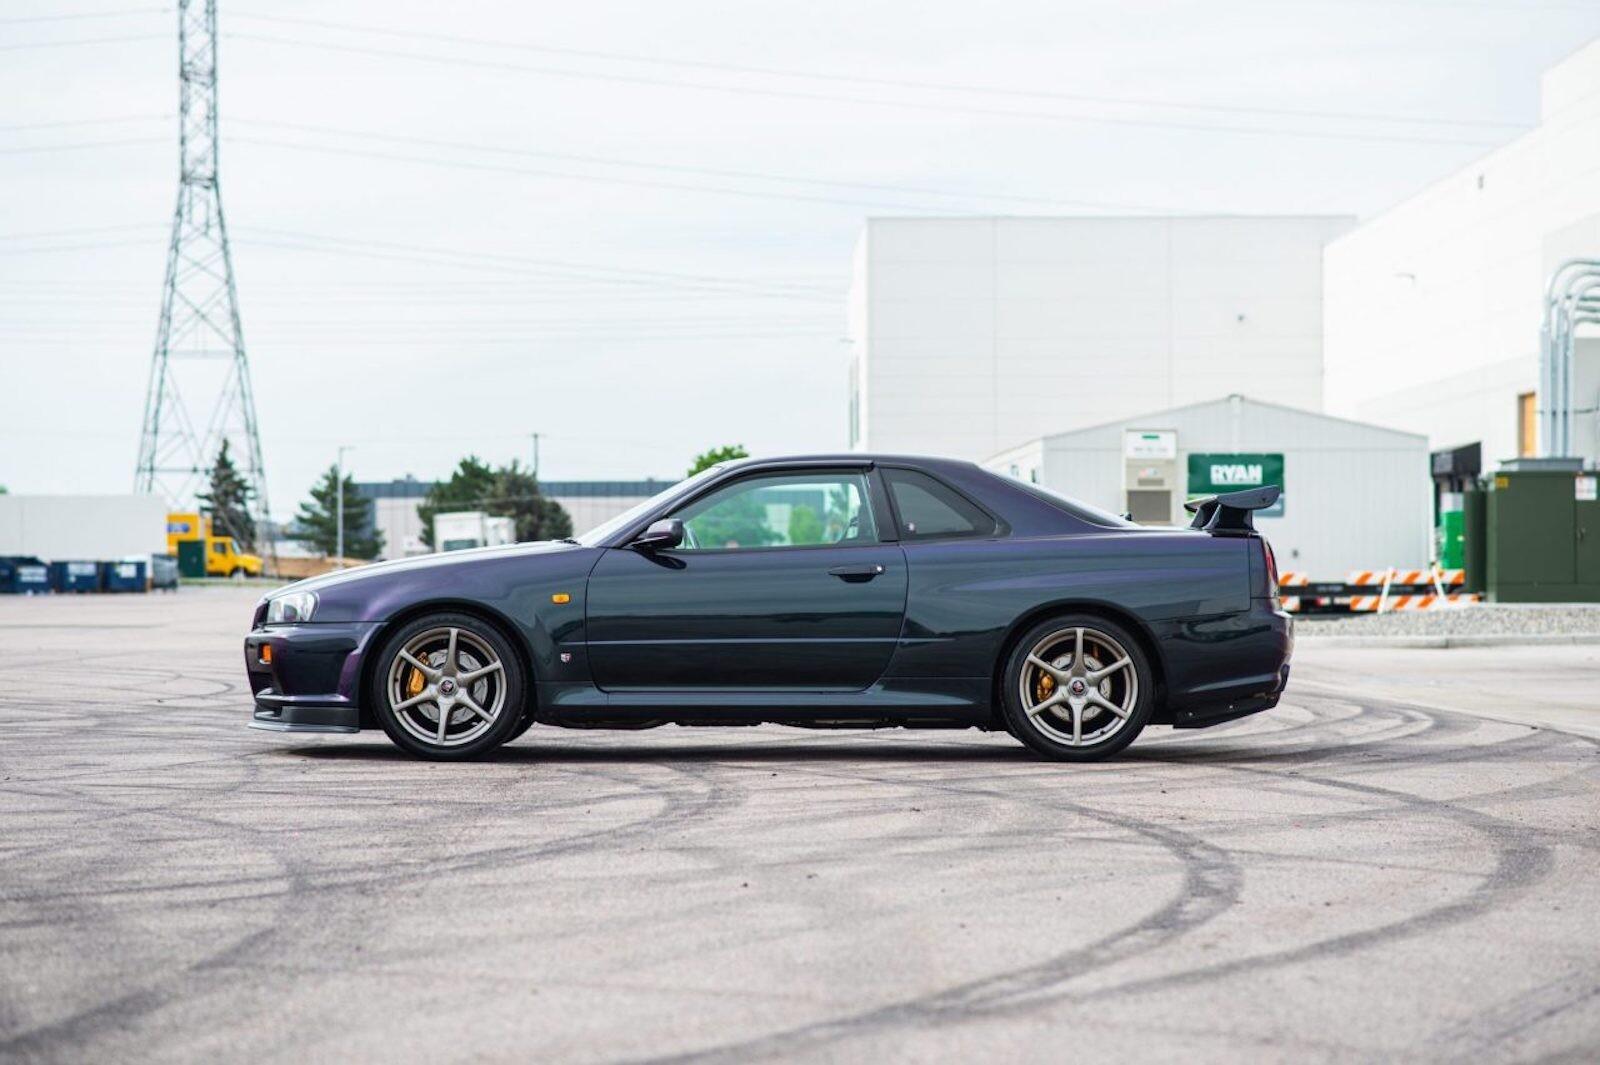 Foto de Nissan Skyline GT-R V-Spec 1999 subasta (6/19)